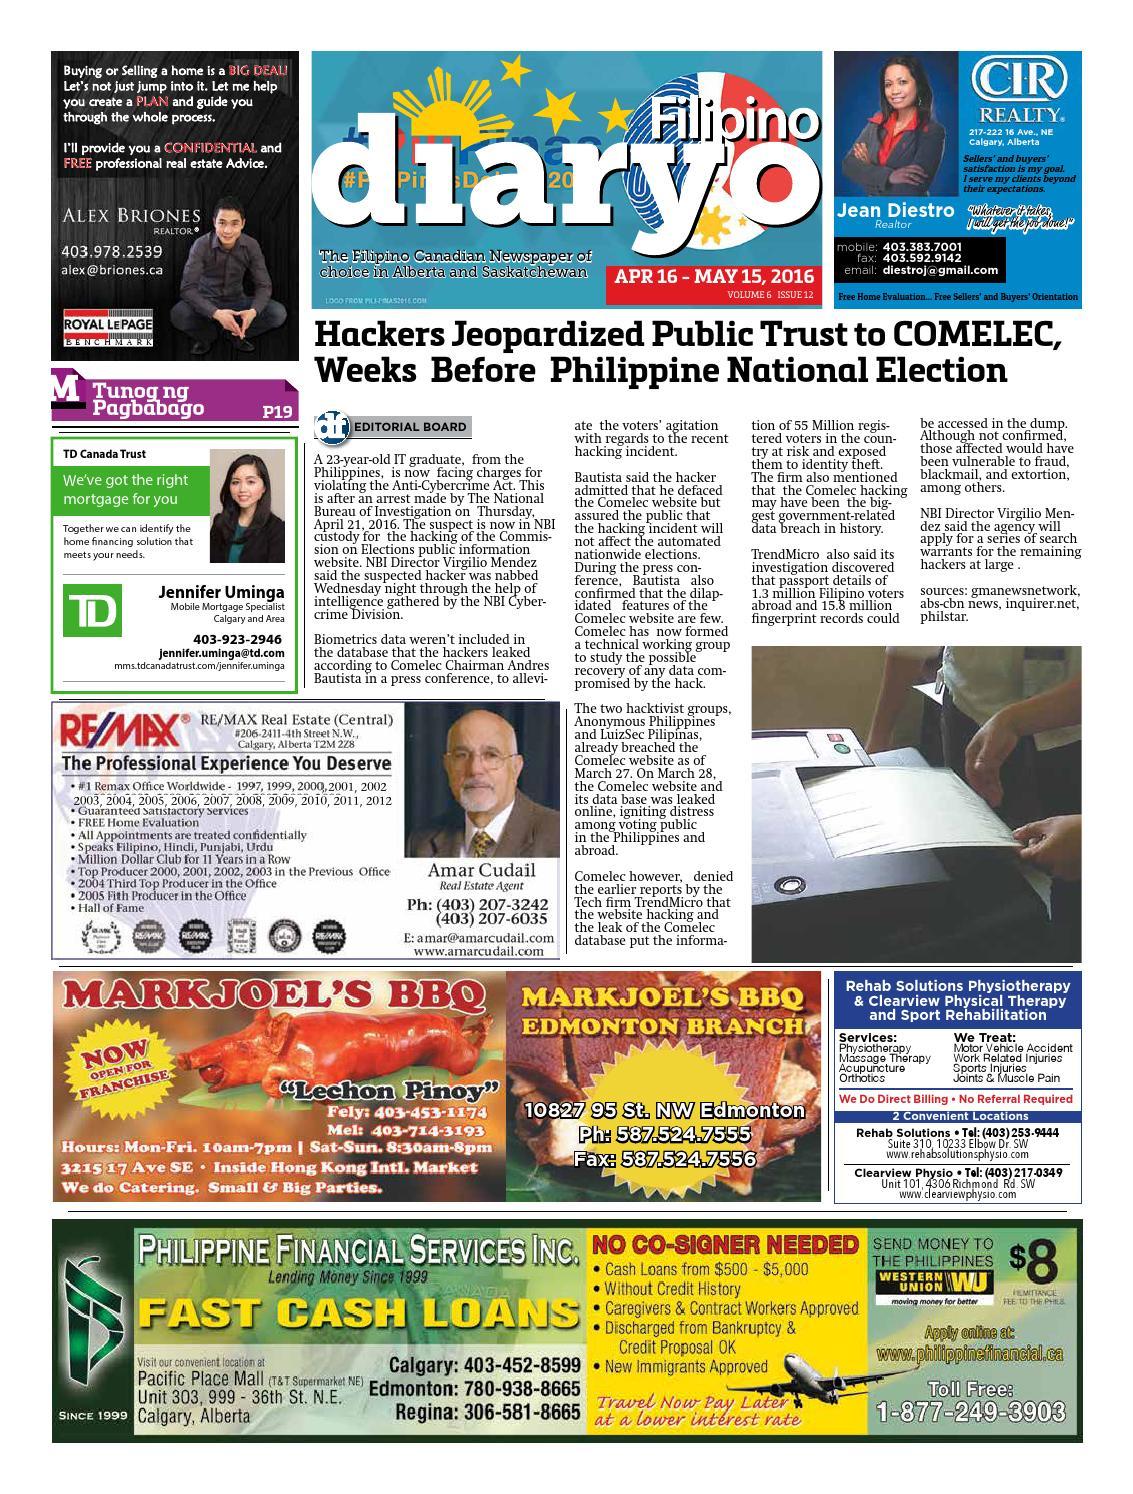 Diaryo Filipino April 2016 by Diaryo Filipino - issuu